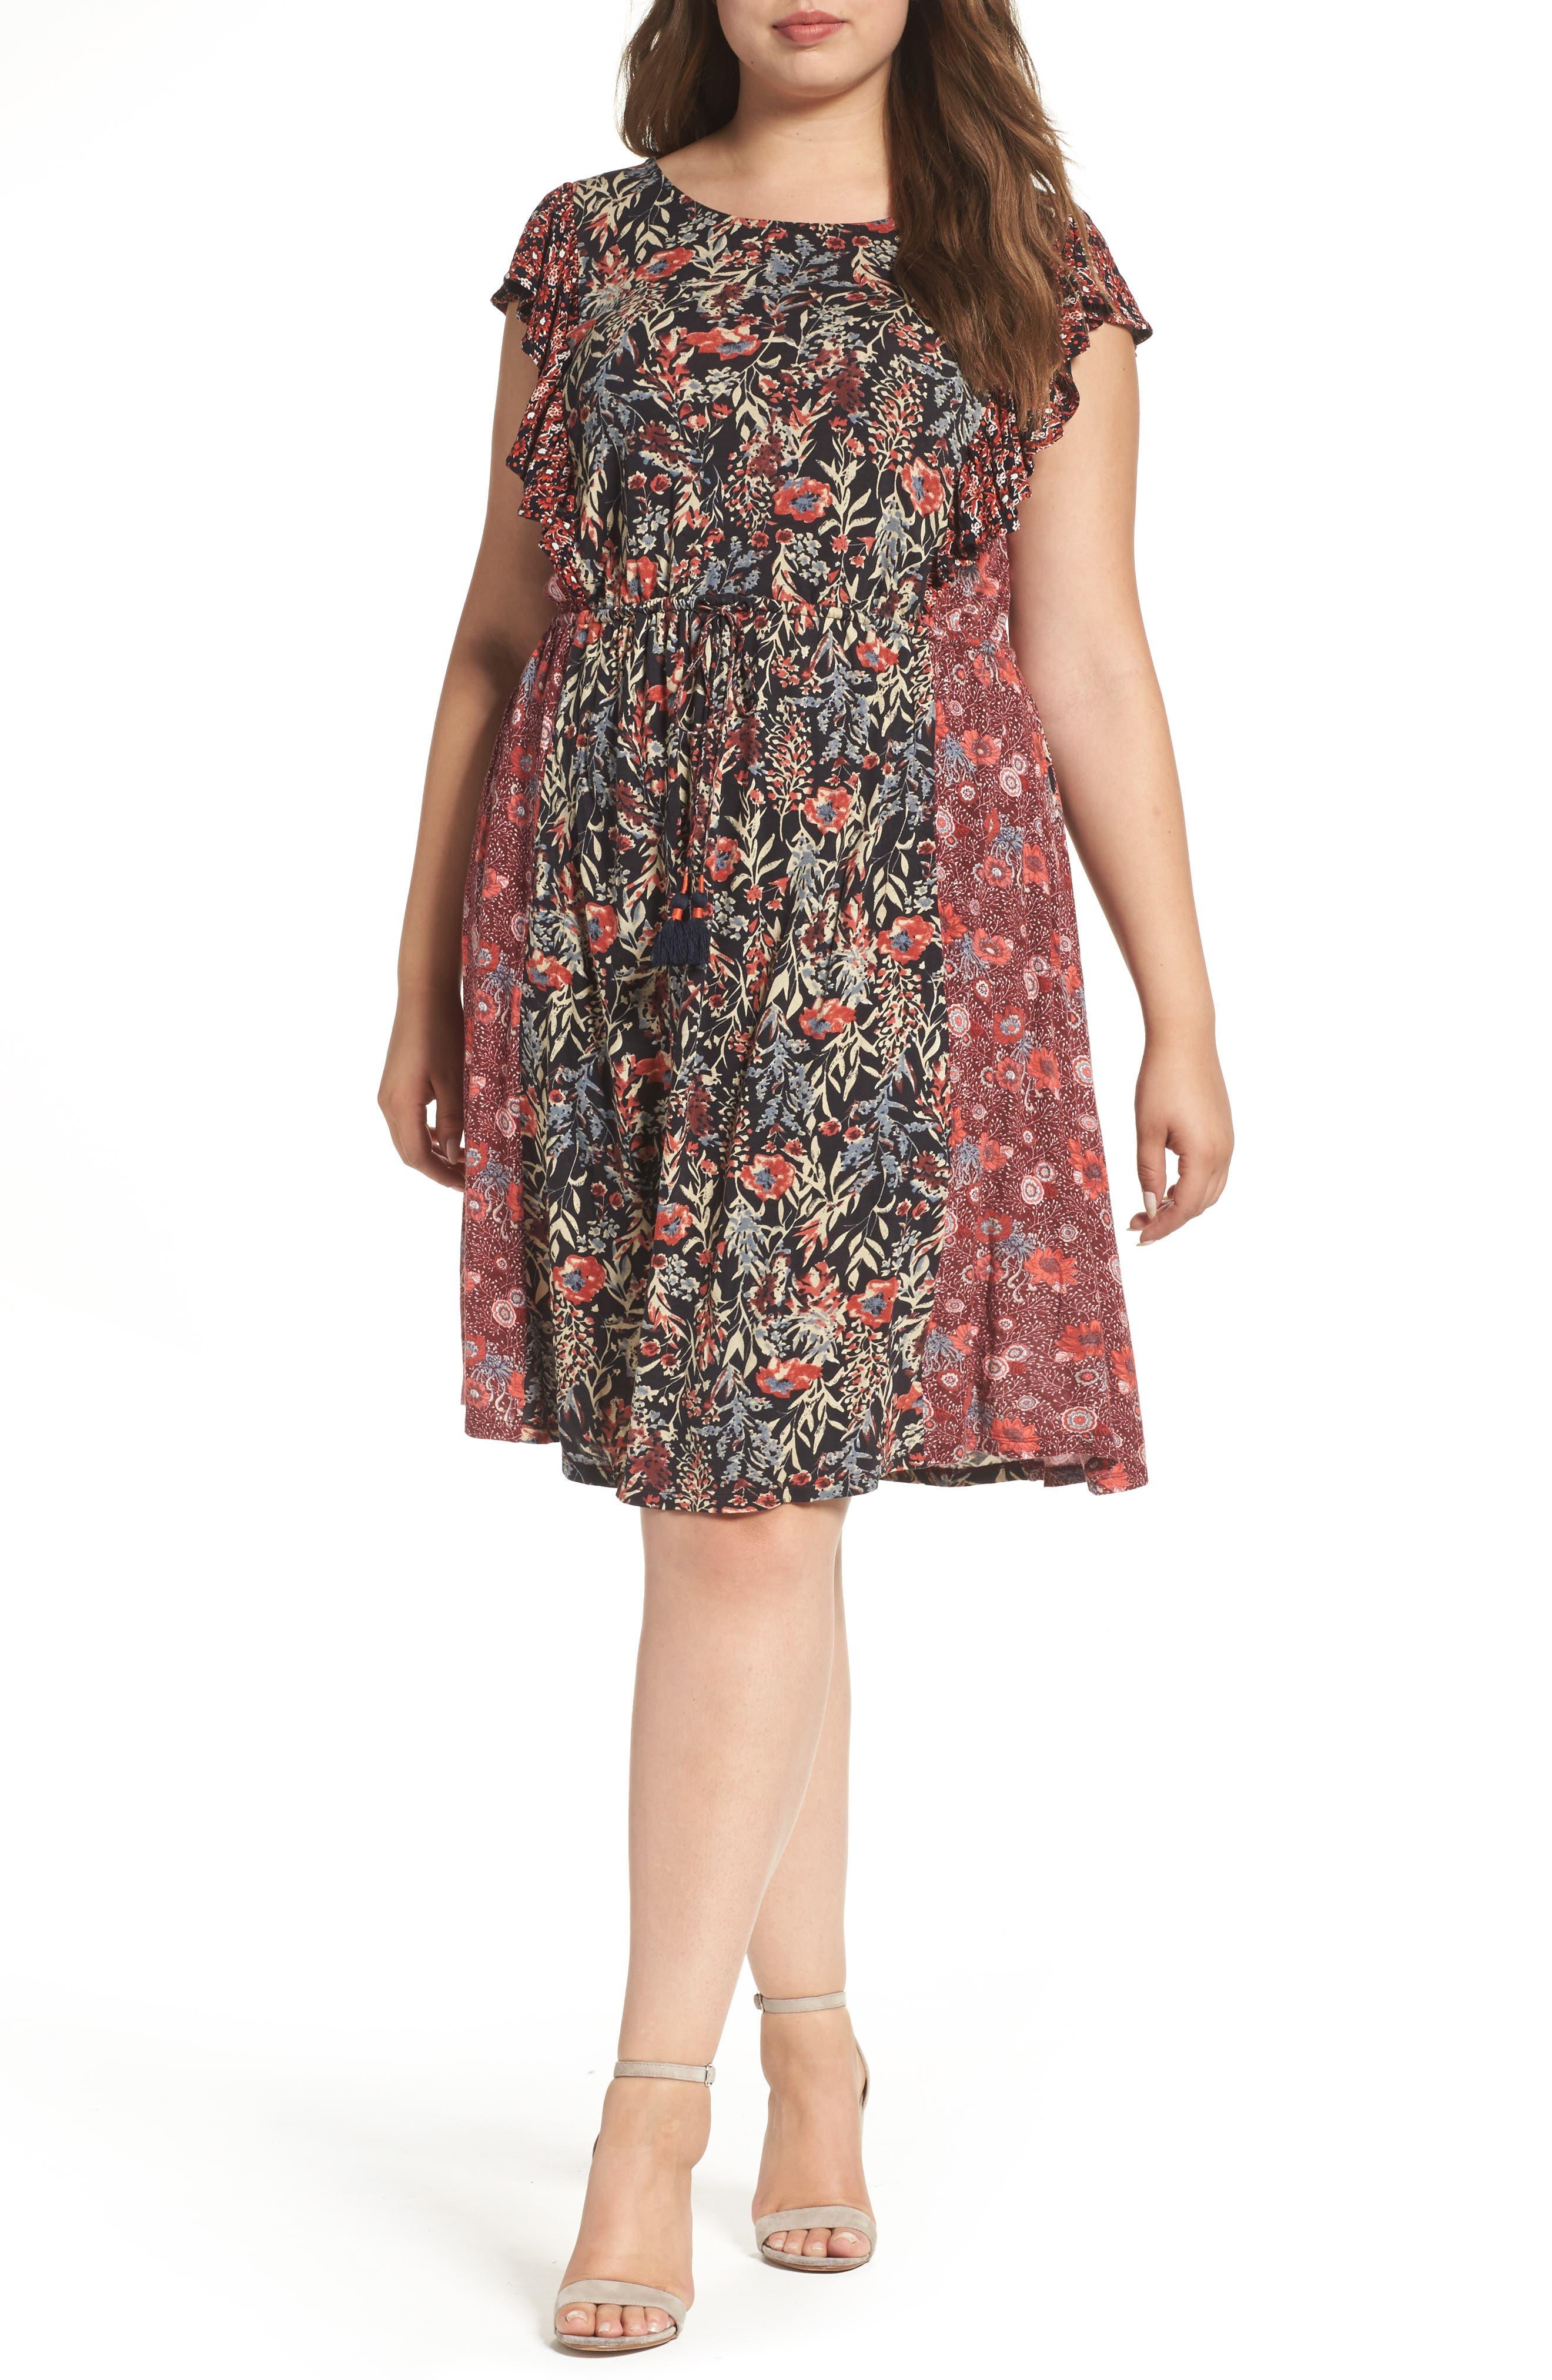 LUCKY BRAND Mixed Floral Print Dress